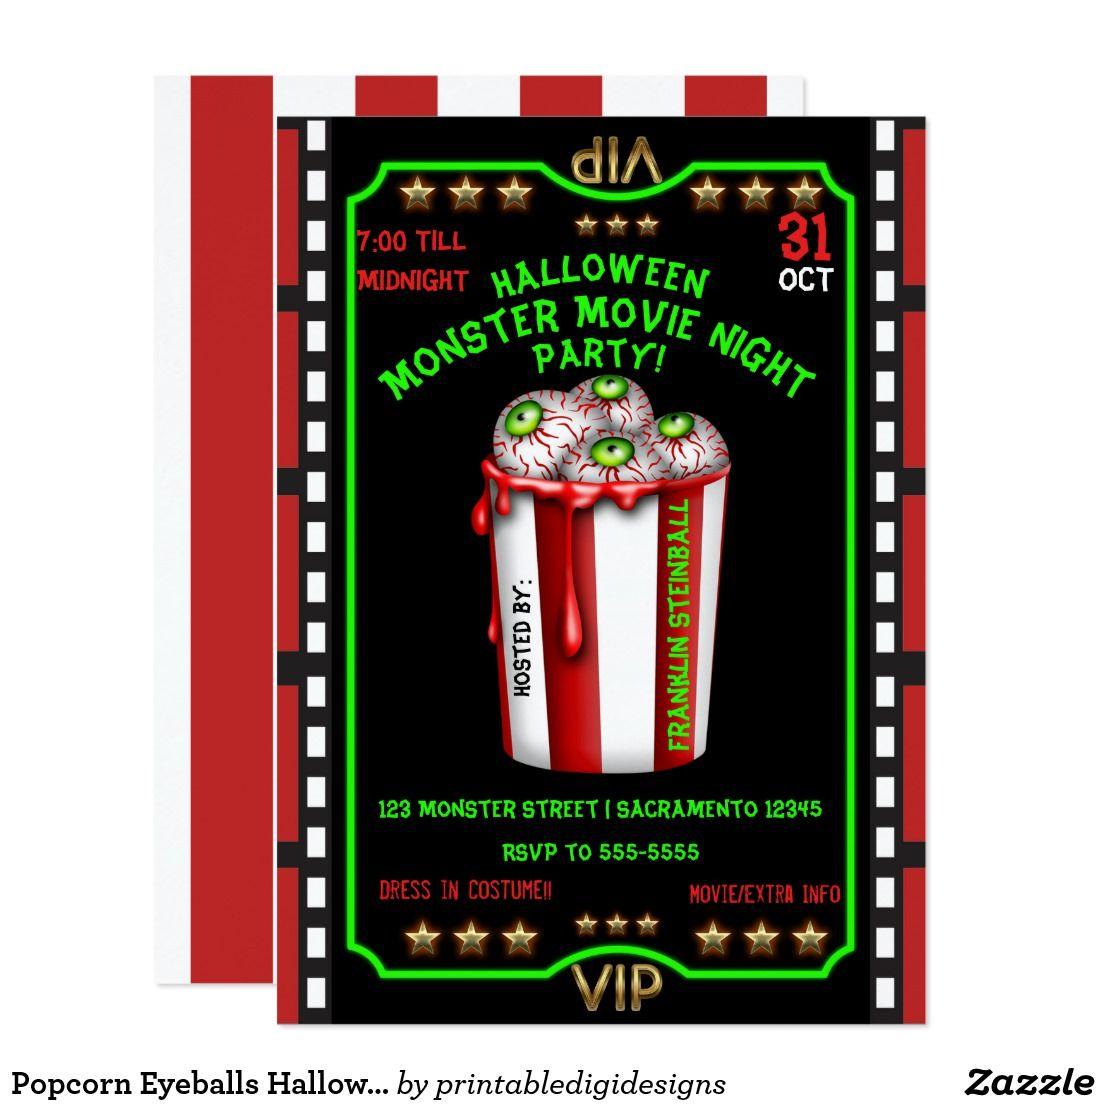 Popcorn Eyeballs Halloween Fright Night Movie Invitation